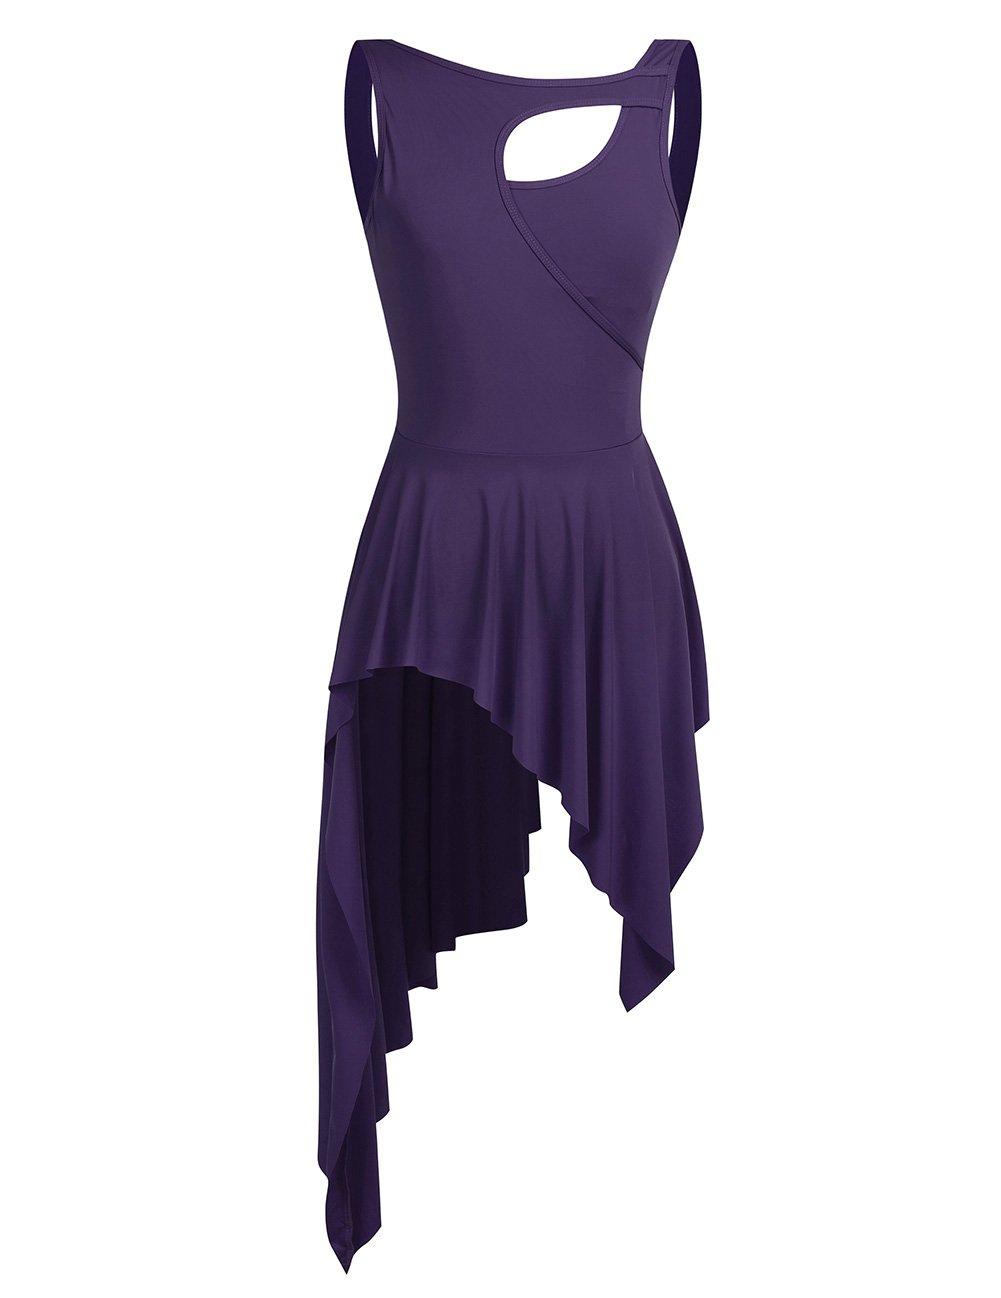 MSemis Women Lyrical Dance Costume Dresses High Low Skirt Camisole Leotard Purple X-Small by MSemis